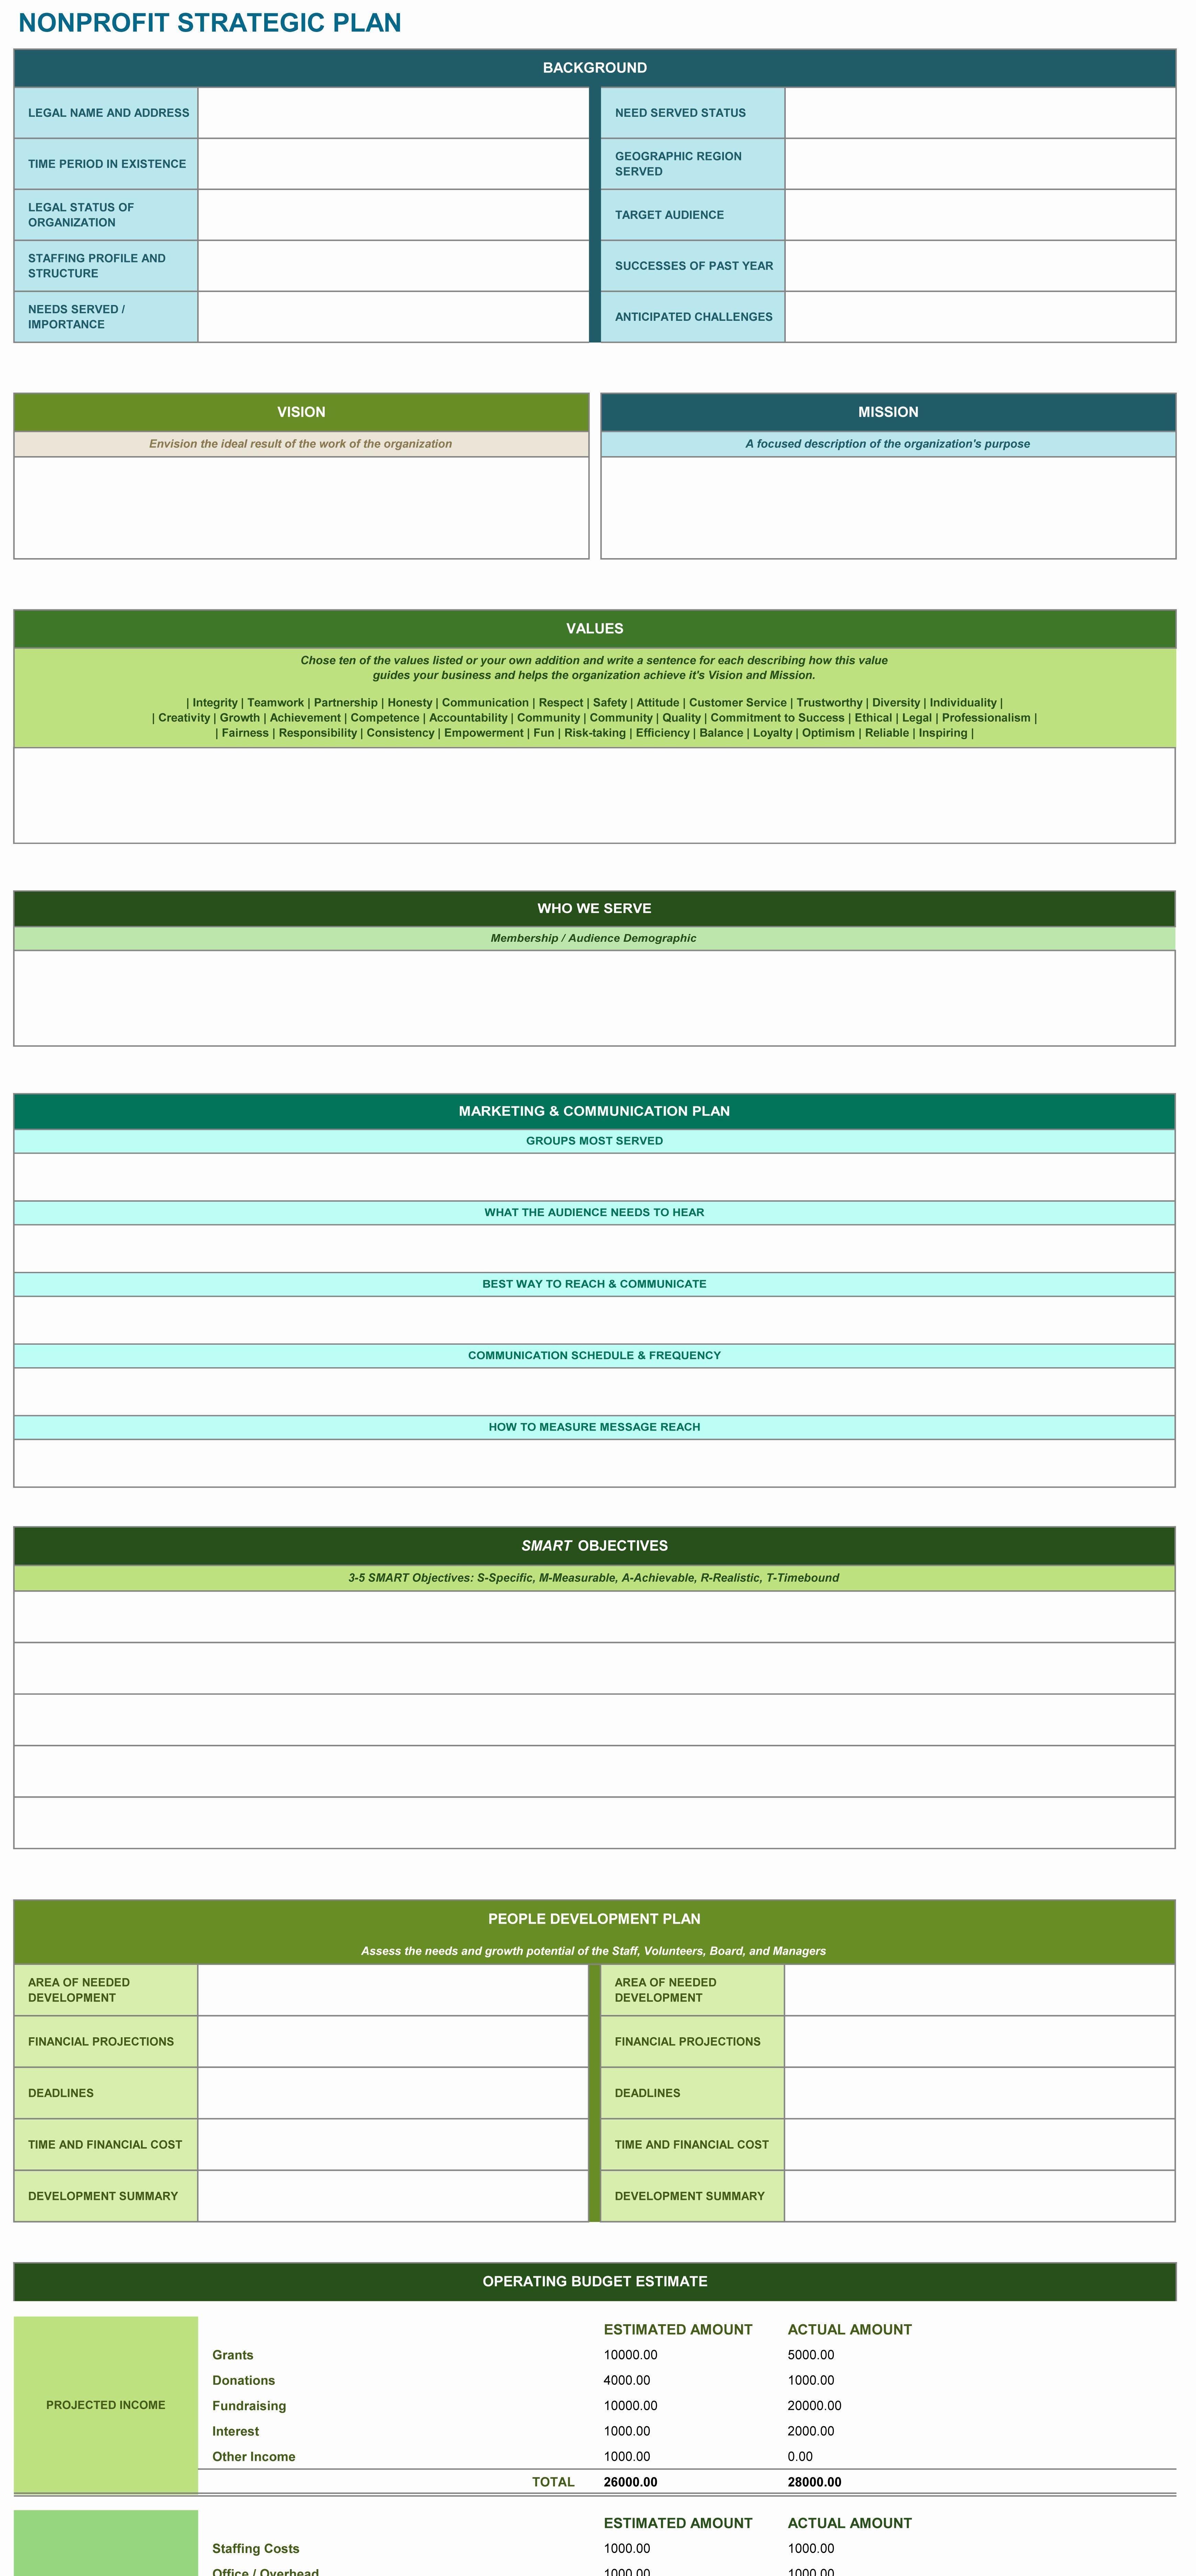 Strategic Planning Nonprofit Template Best Of 9 Free Strategic Planning Templates Smartsheet